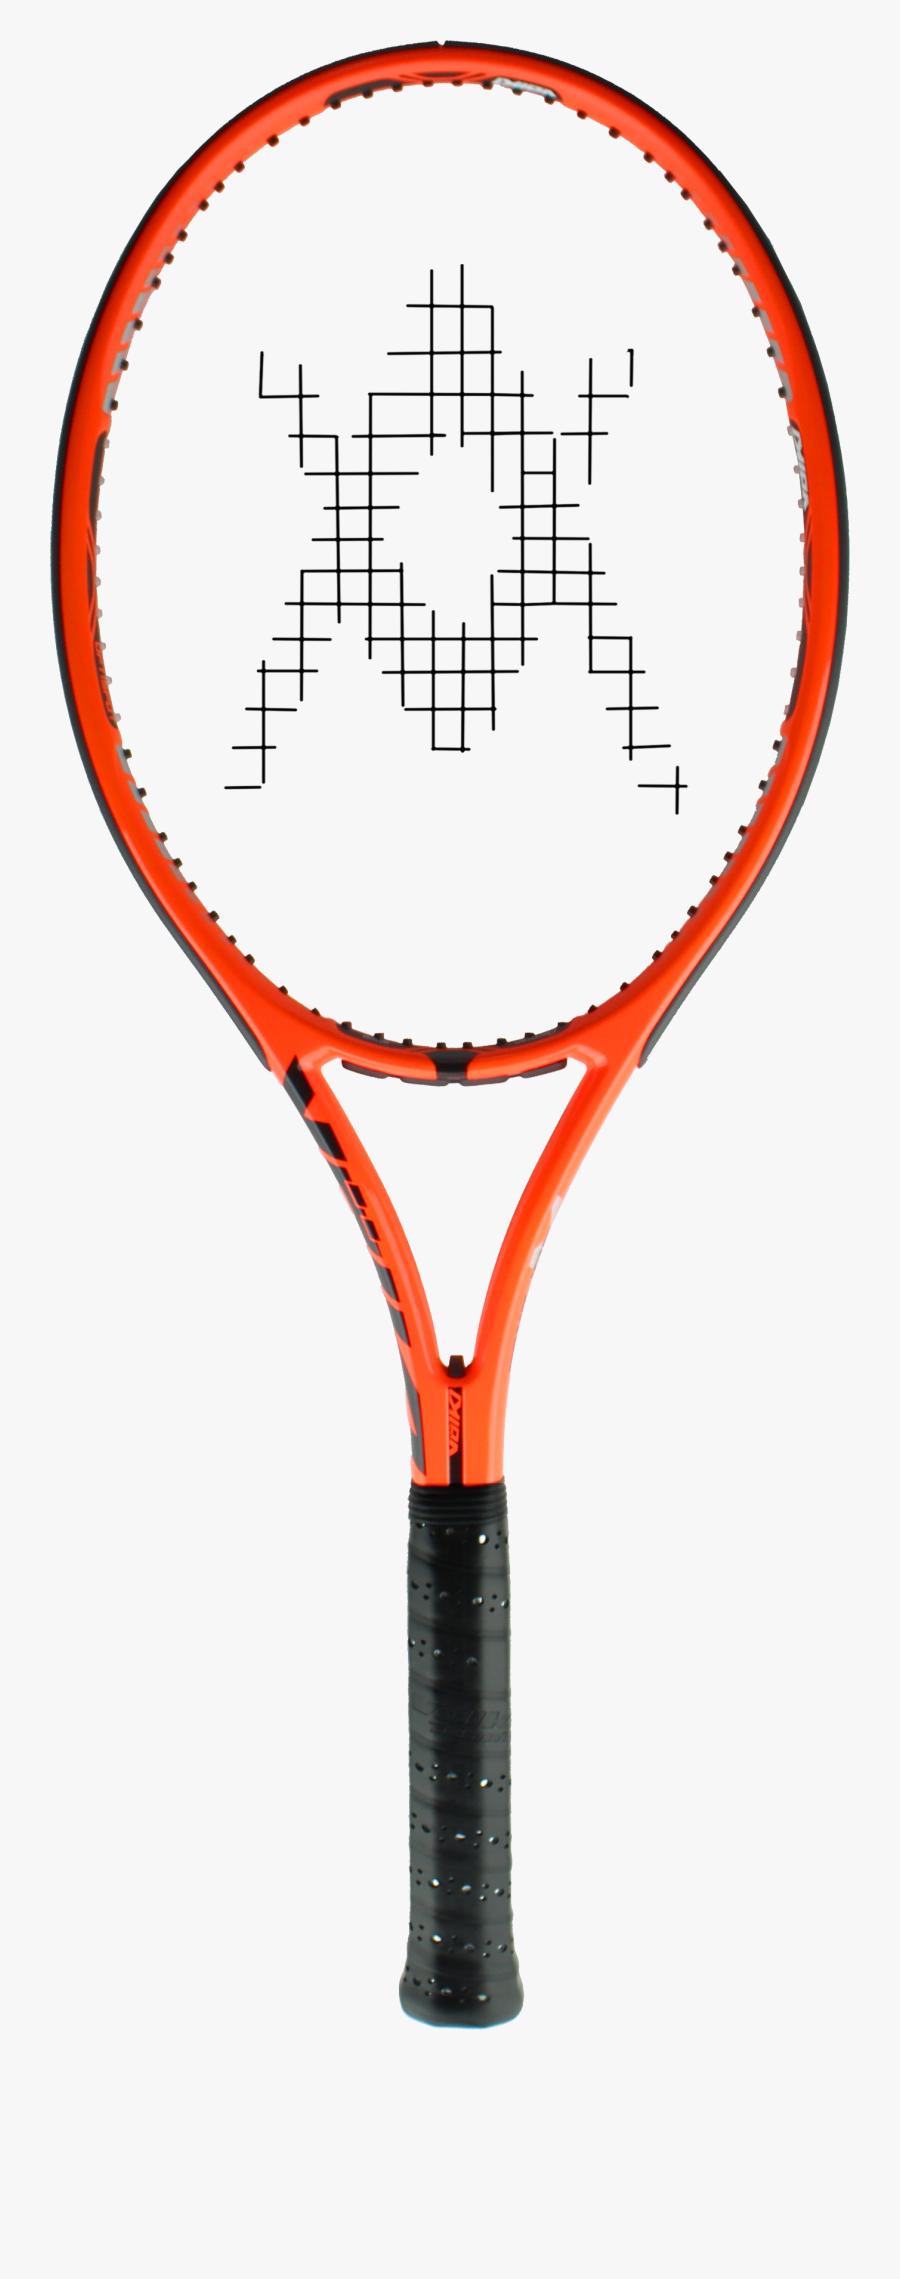 Tennis Png Images Free Download, Tennis Ball Racket - Transparent Background Tennis Racket Png, Transparent Clipart